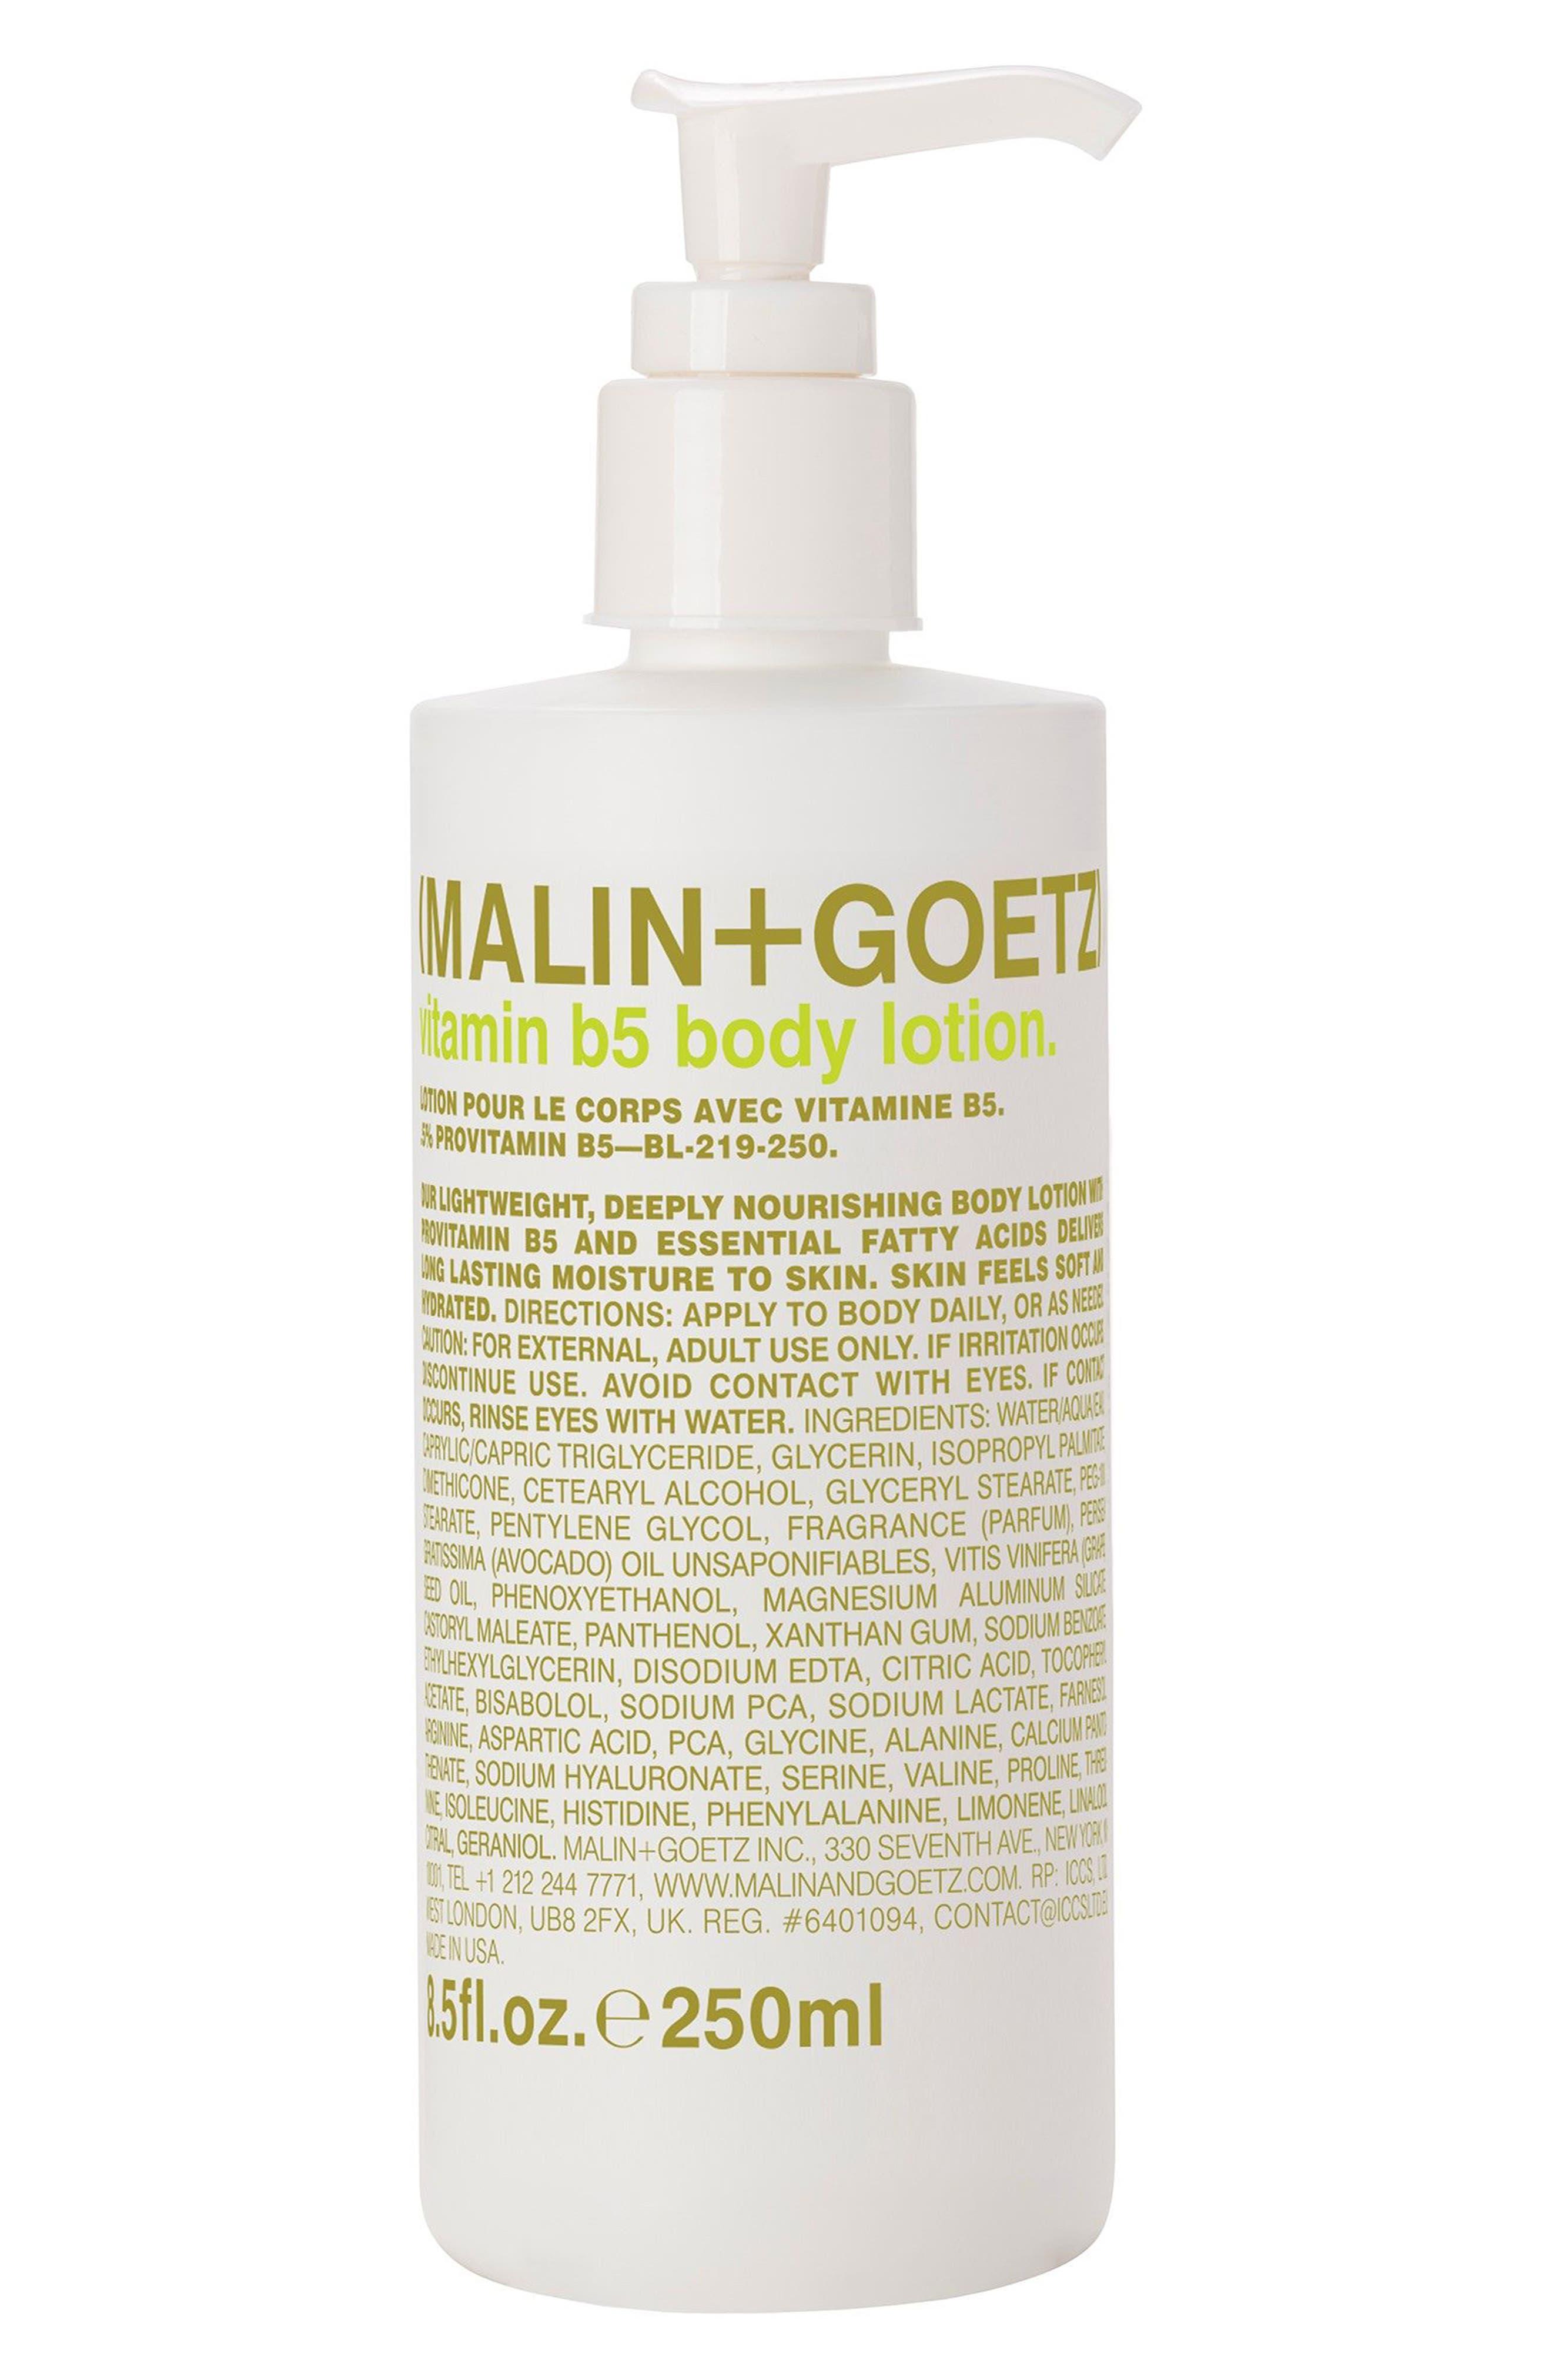 Main Image - MALIN+GOETZ Vitamin B5 Body Lotion